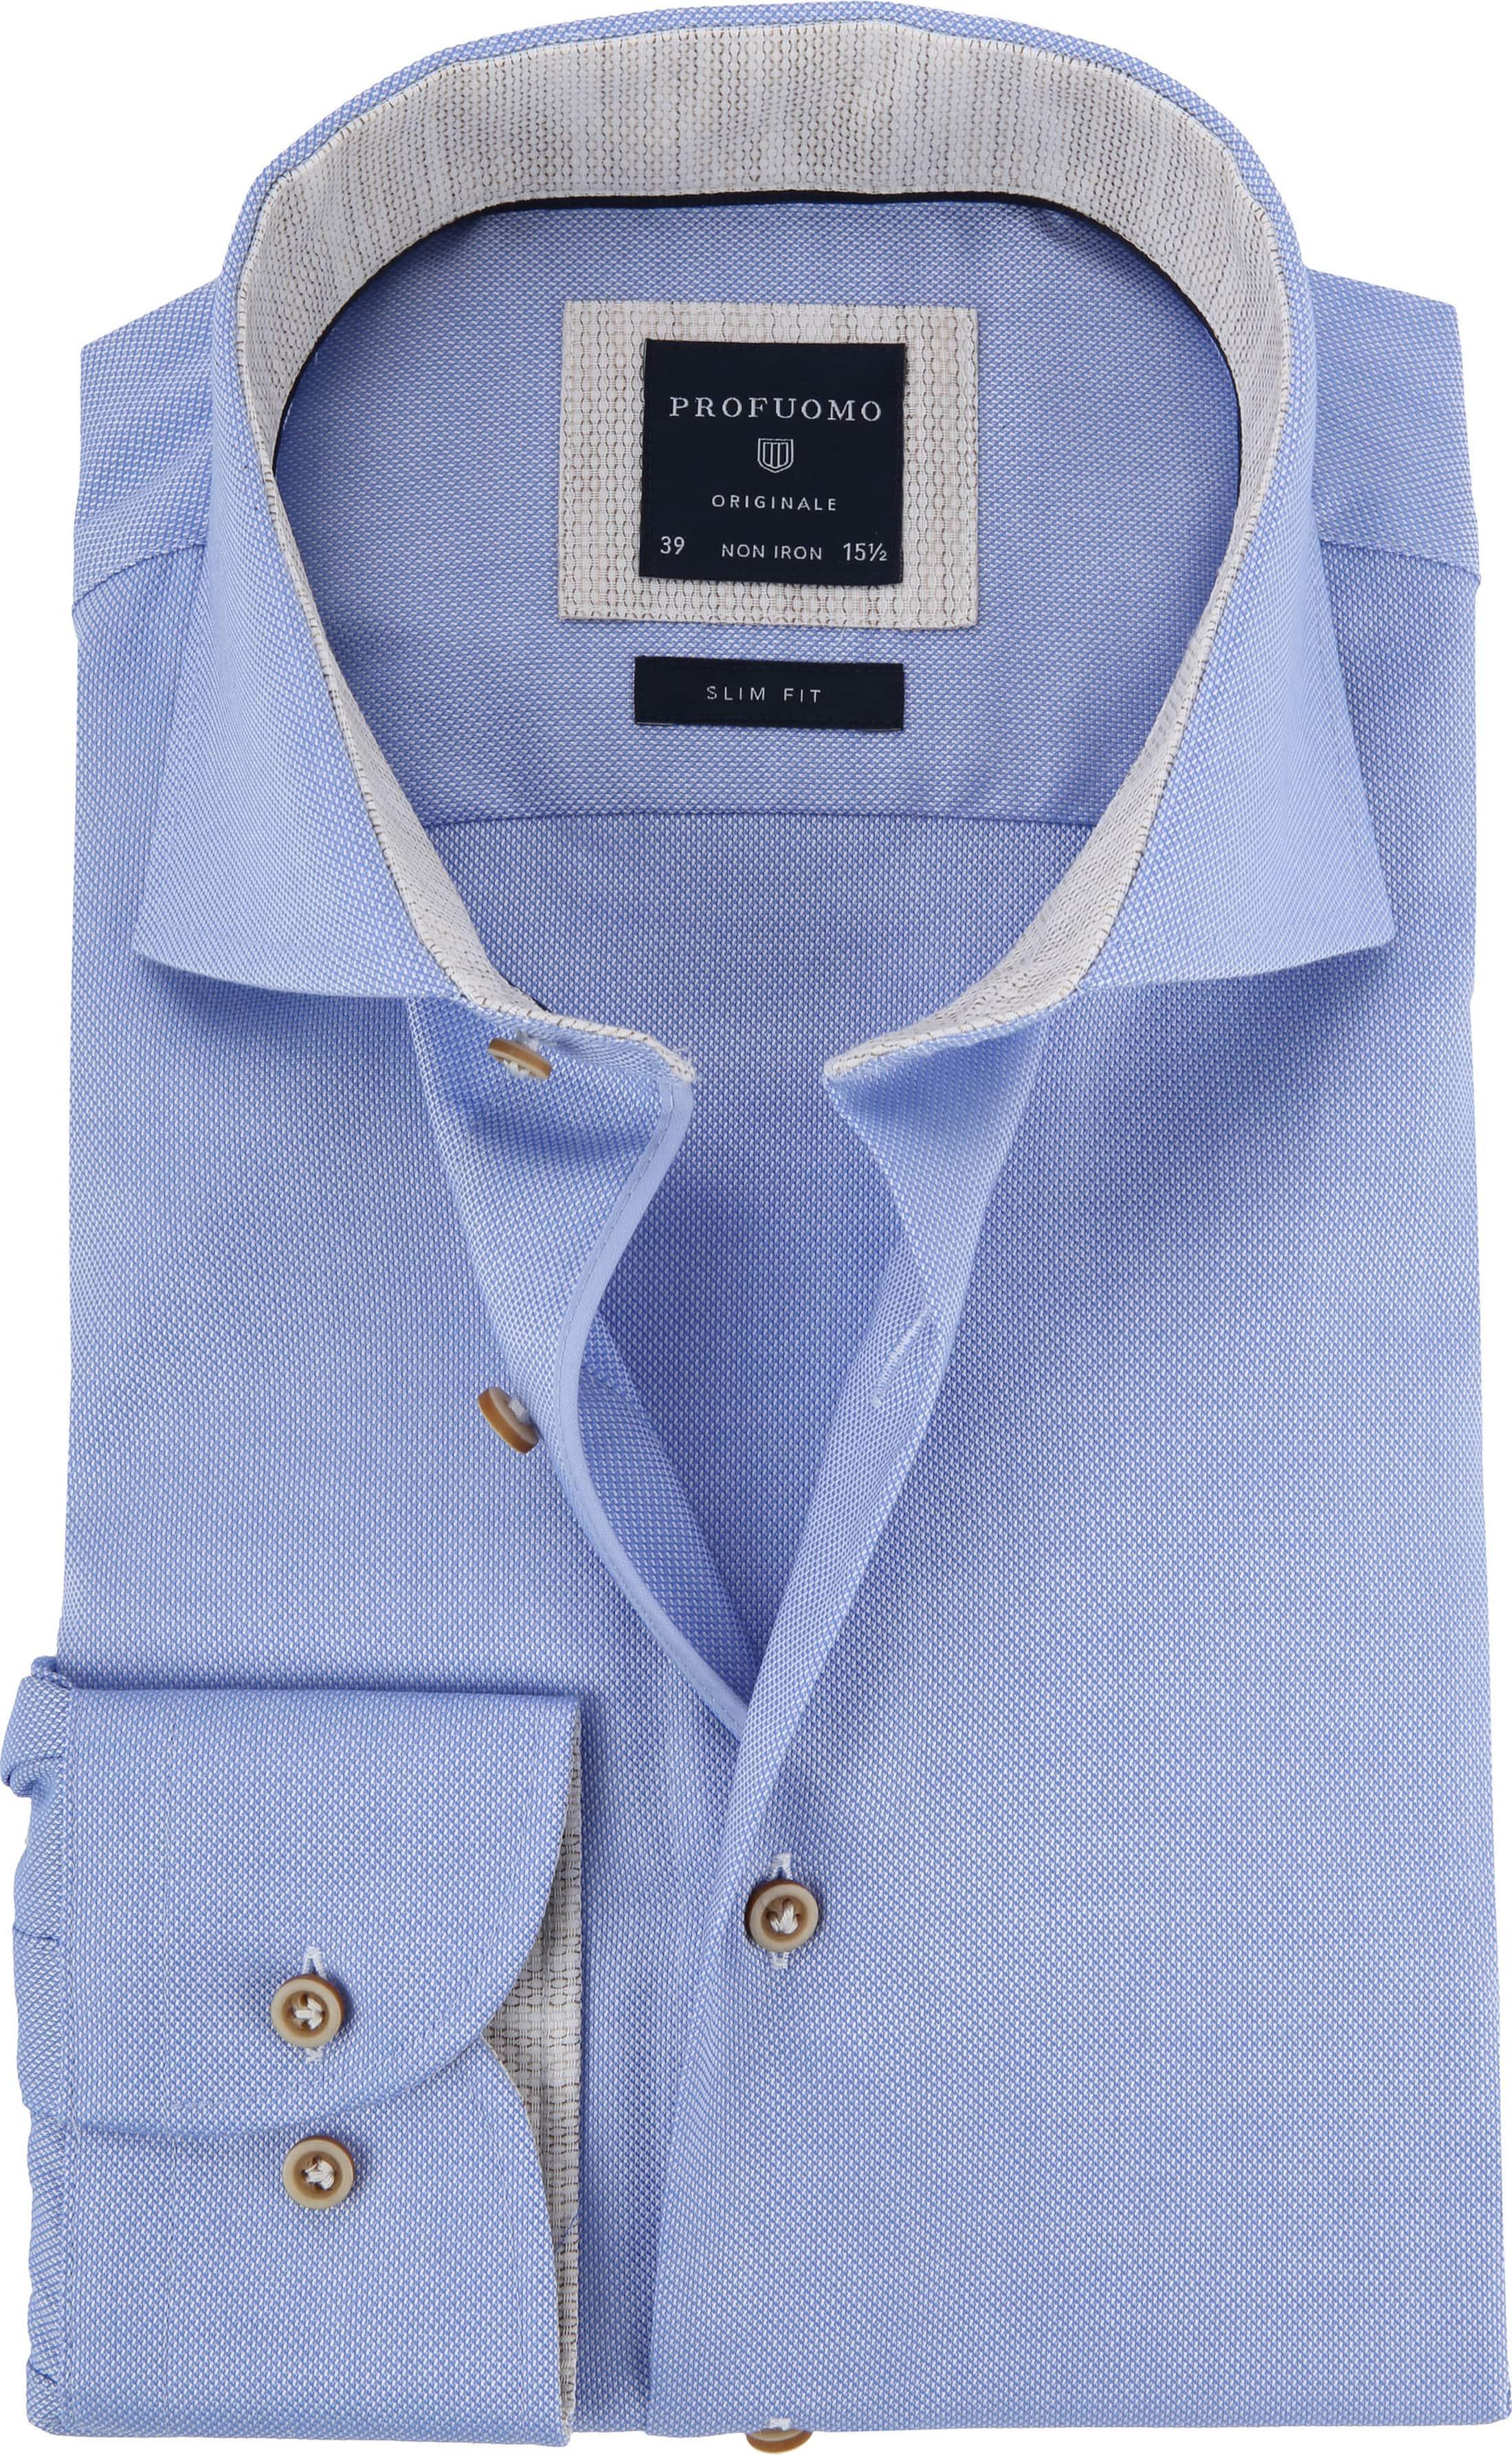 Profuomo Overhemd Blauw CAW foto 0